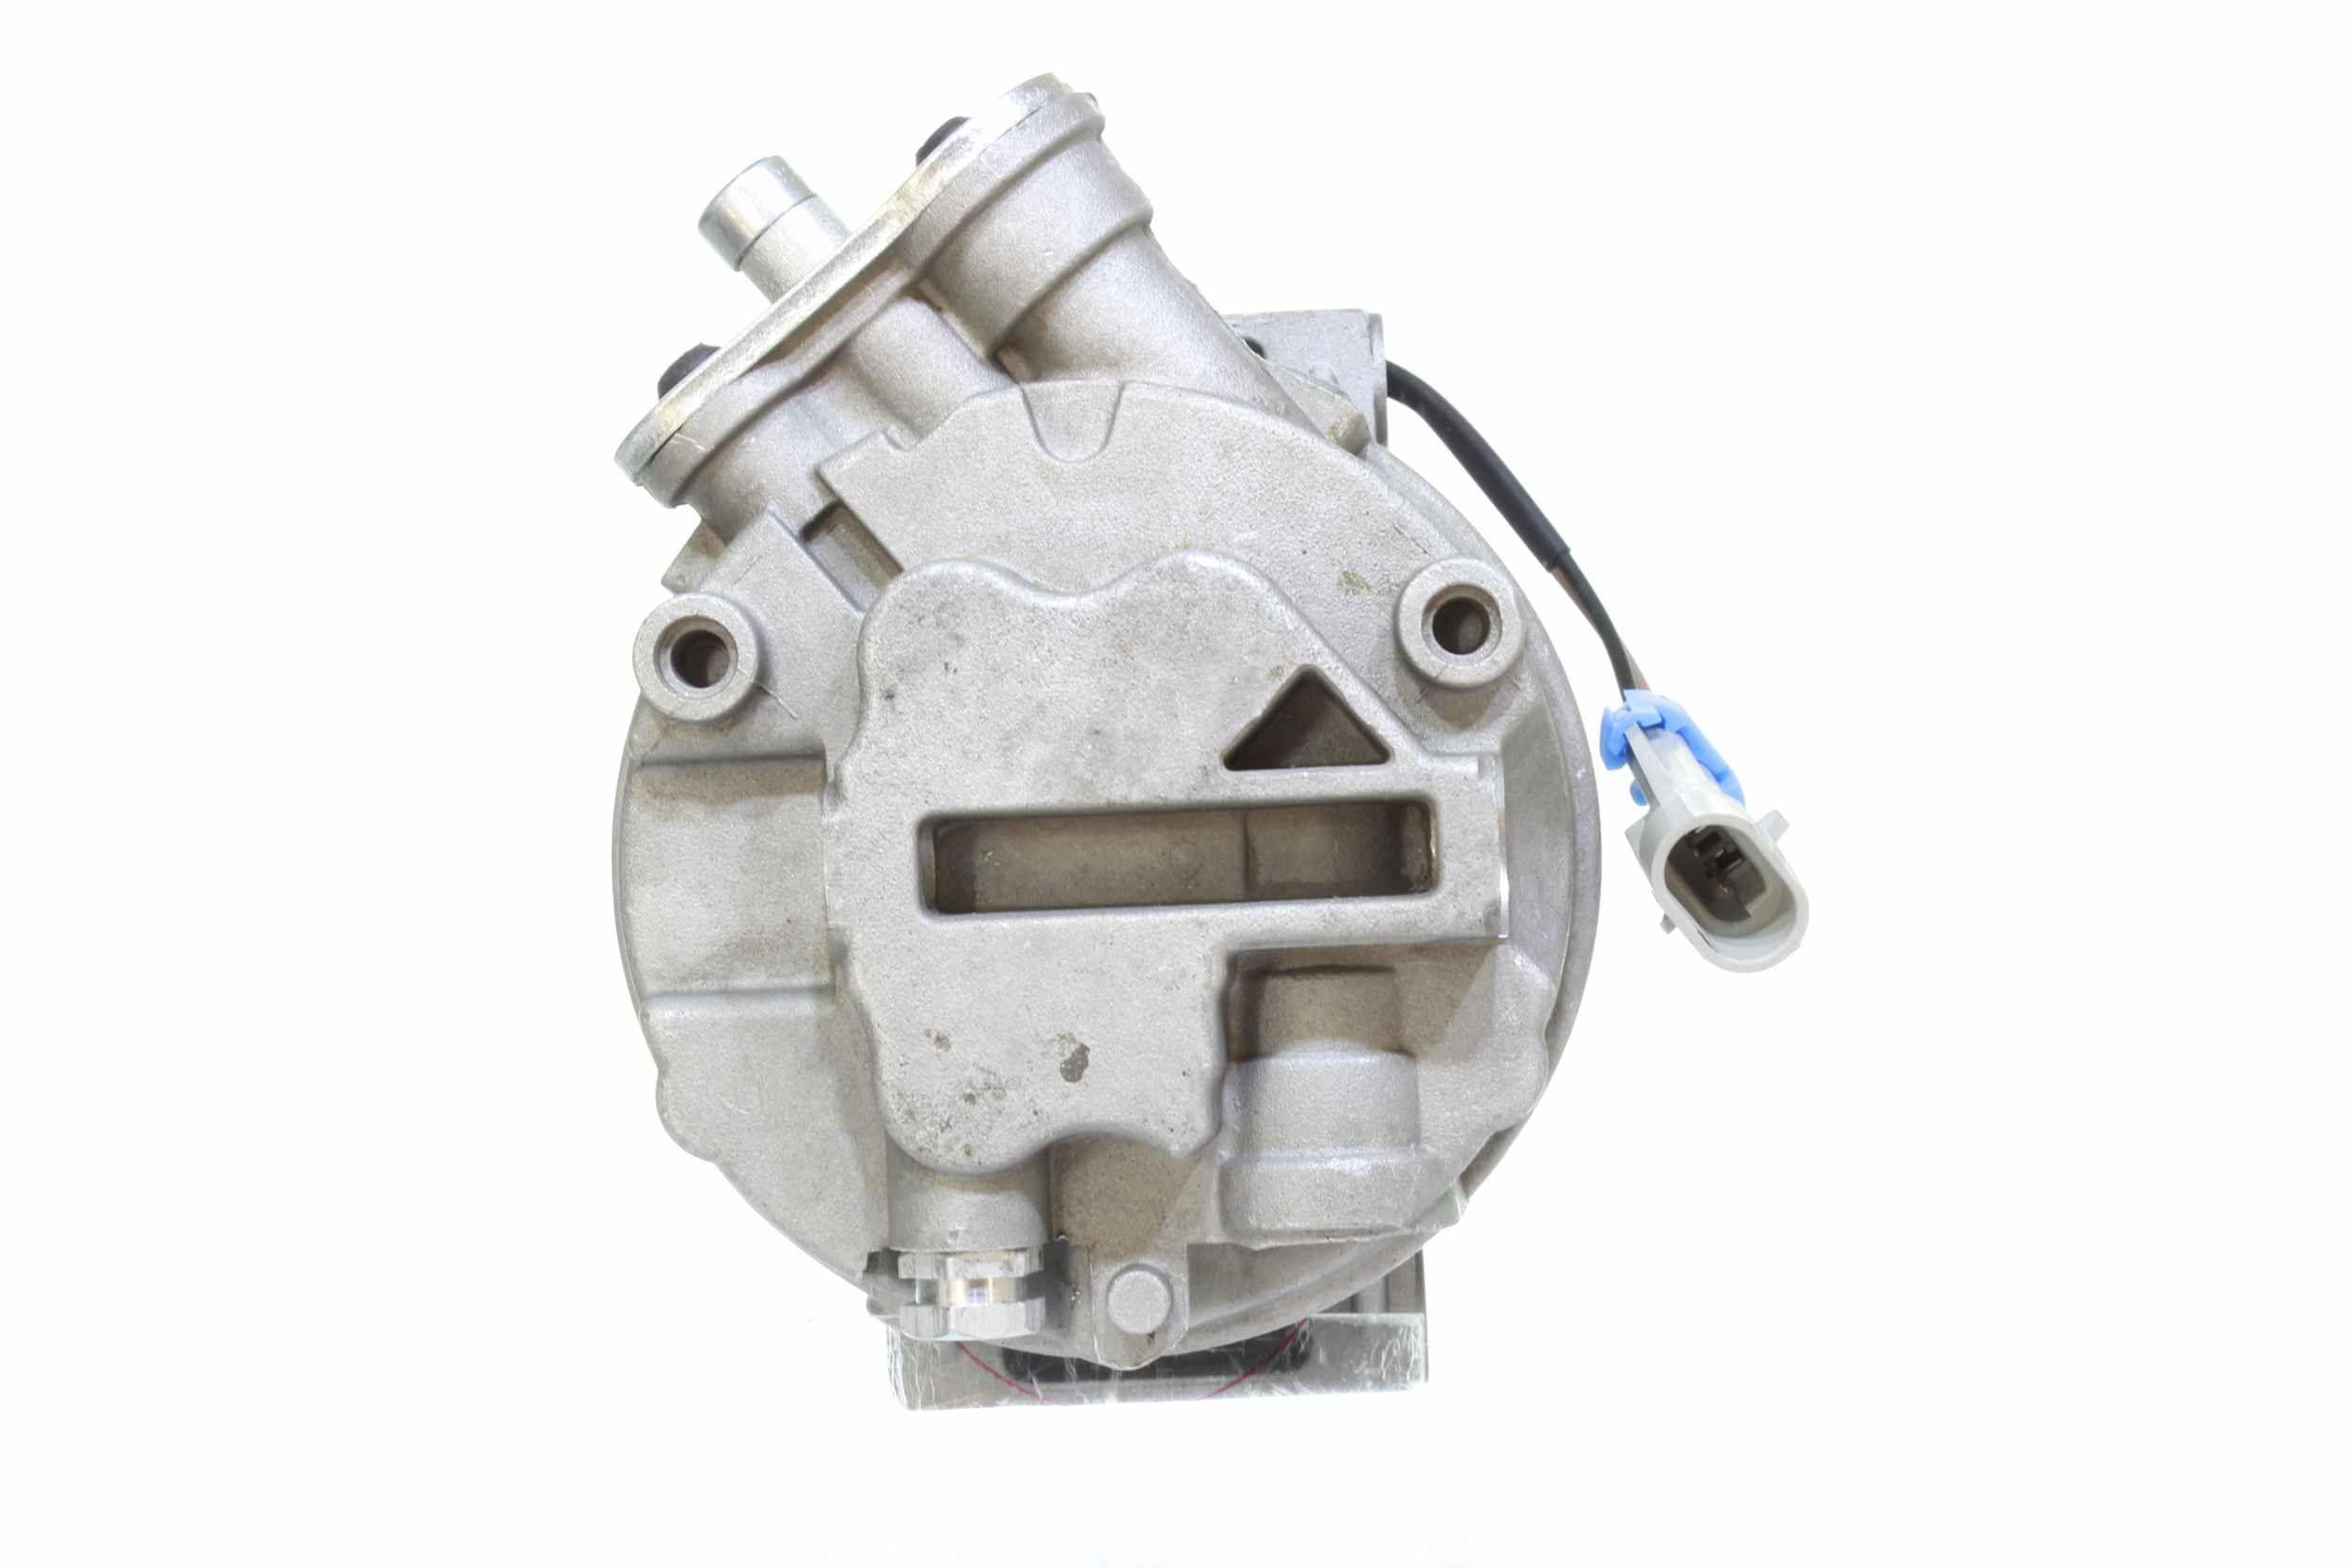 10550072 Kompressor, Klimaanlage ALANKO 550072 - Große Auswahl - stark reduziert